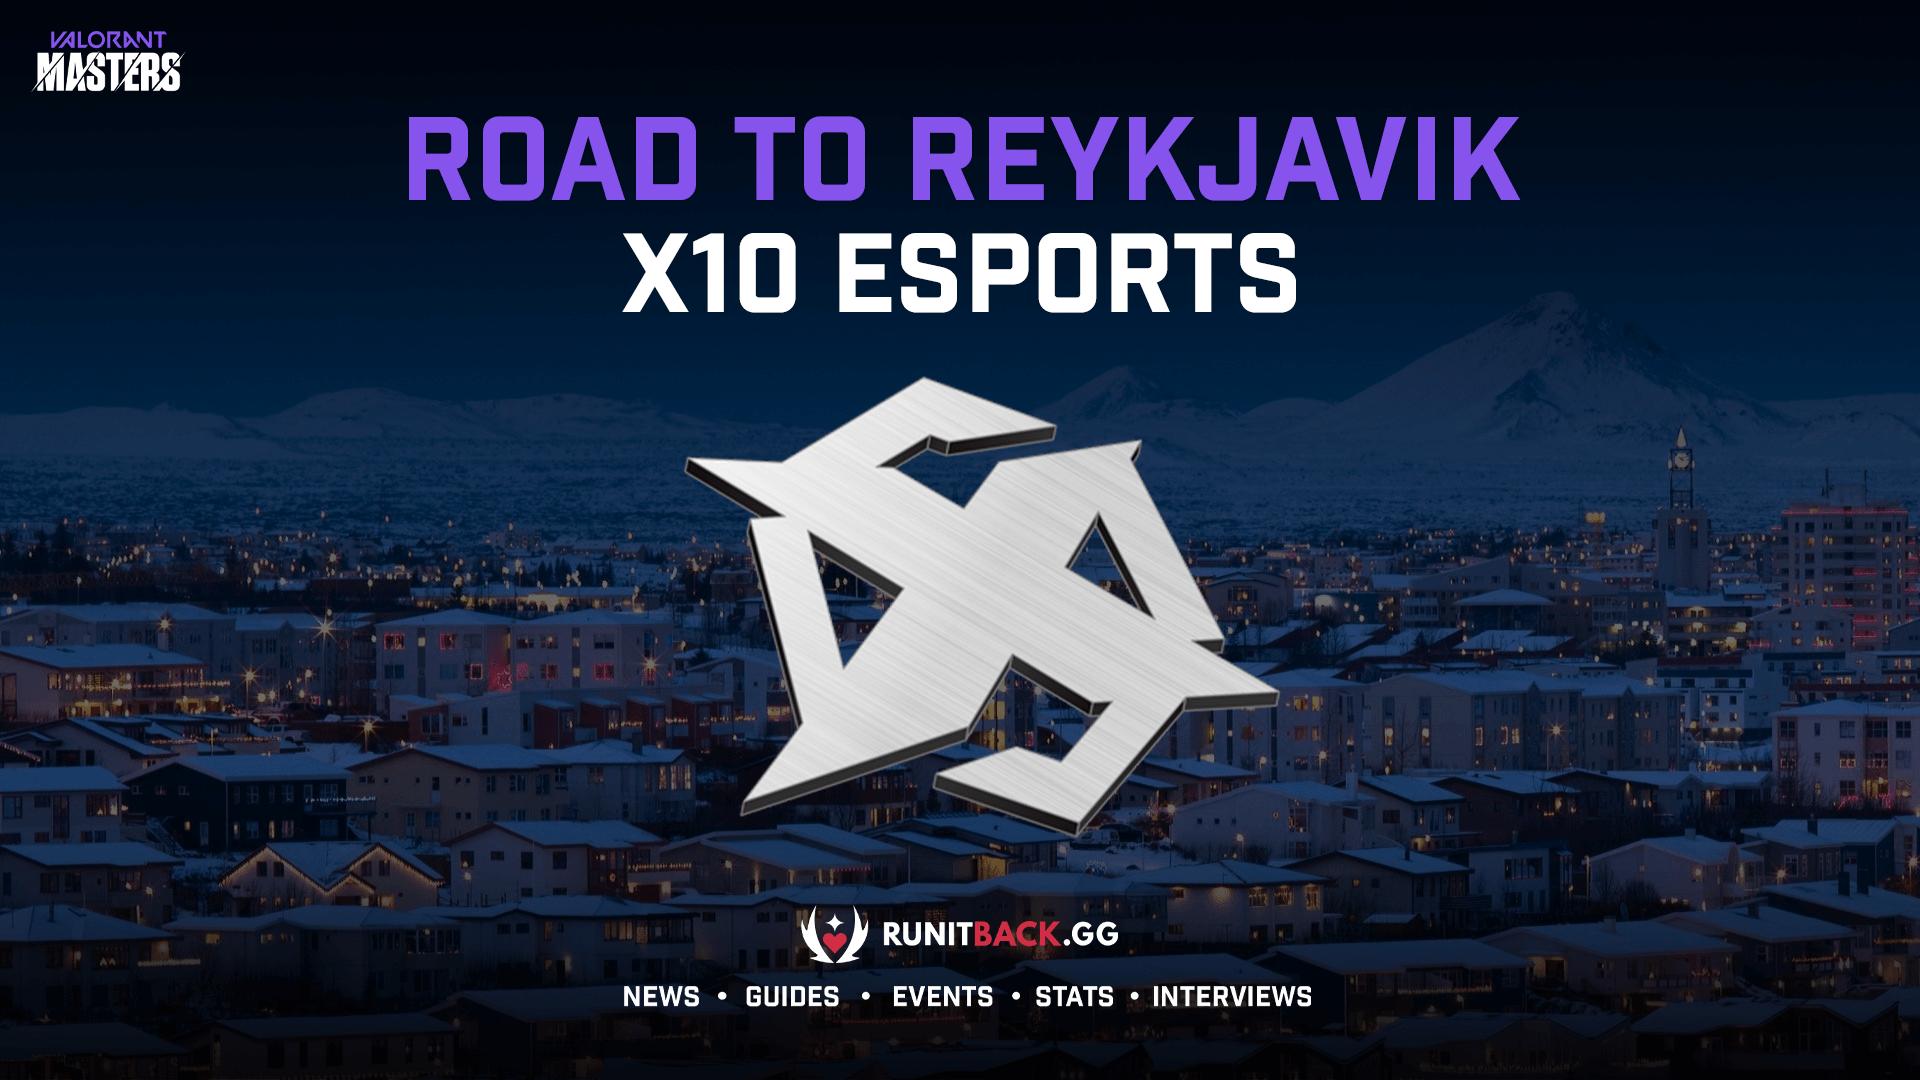 Road to Masters Reykjavik — X10 Esports